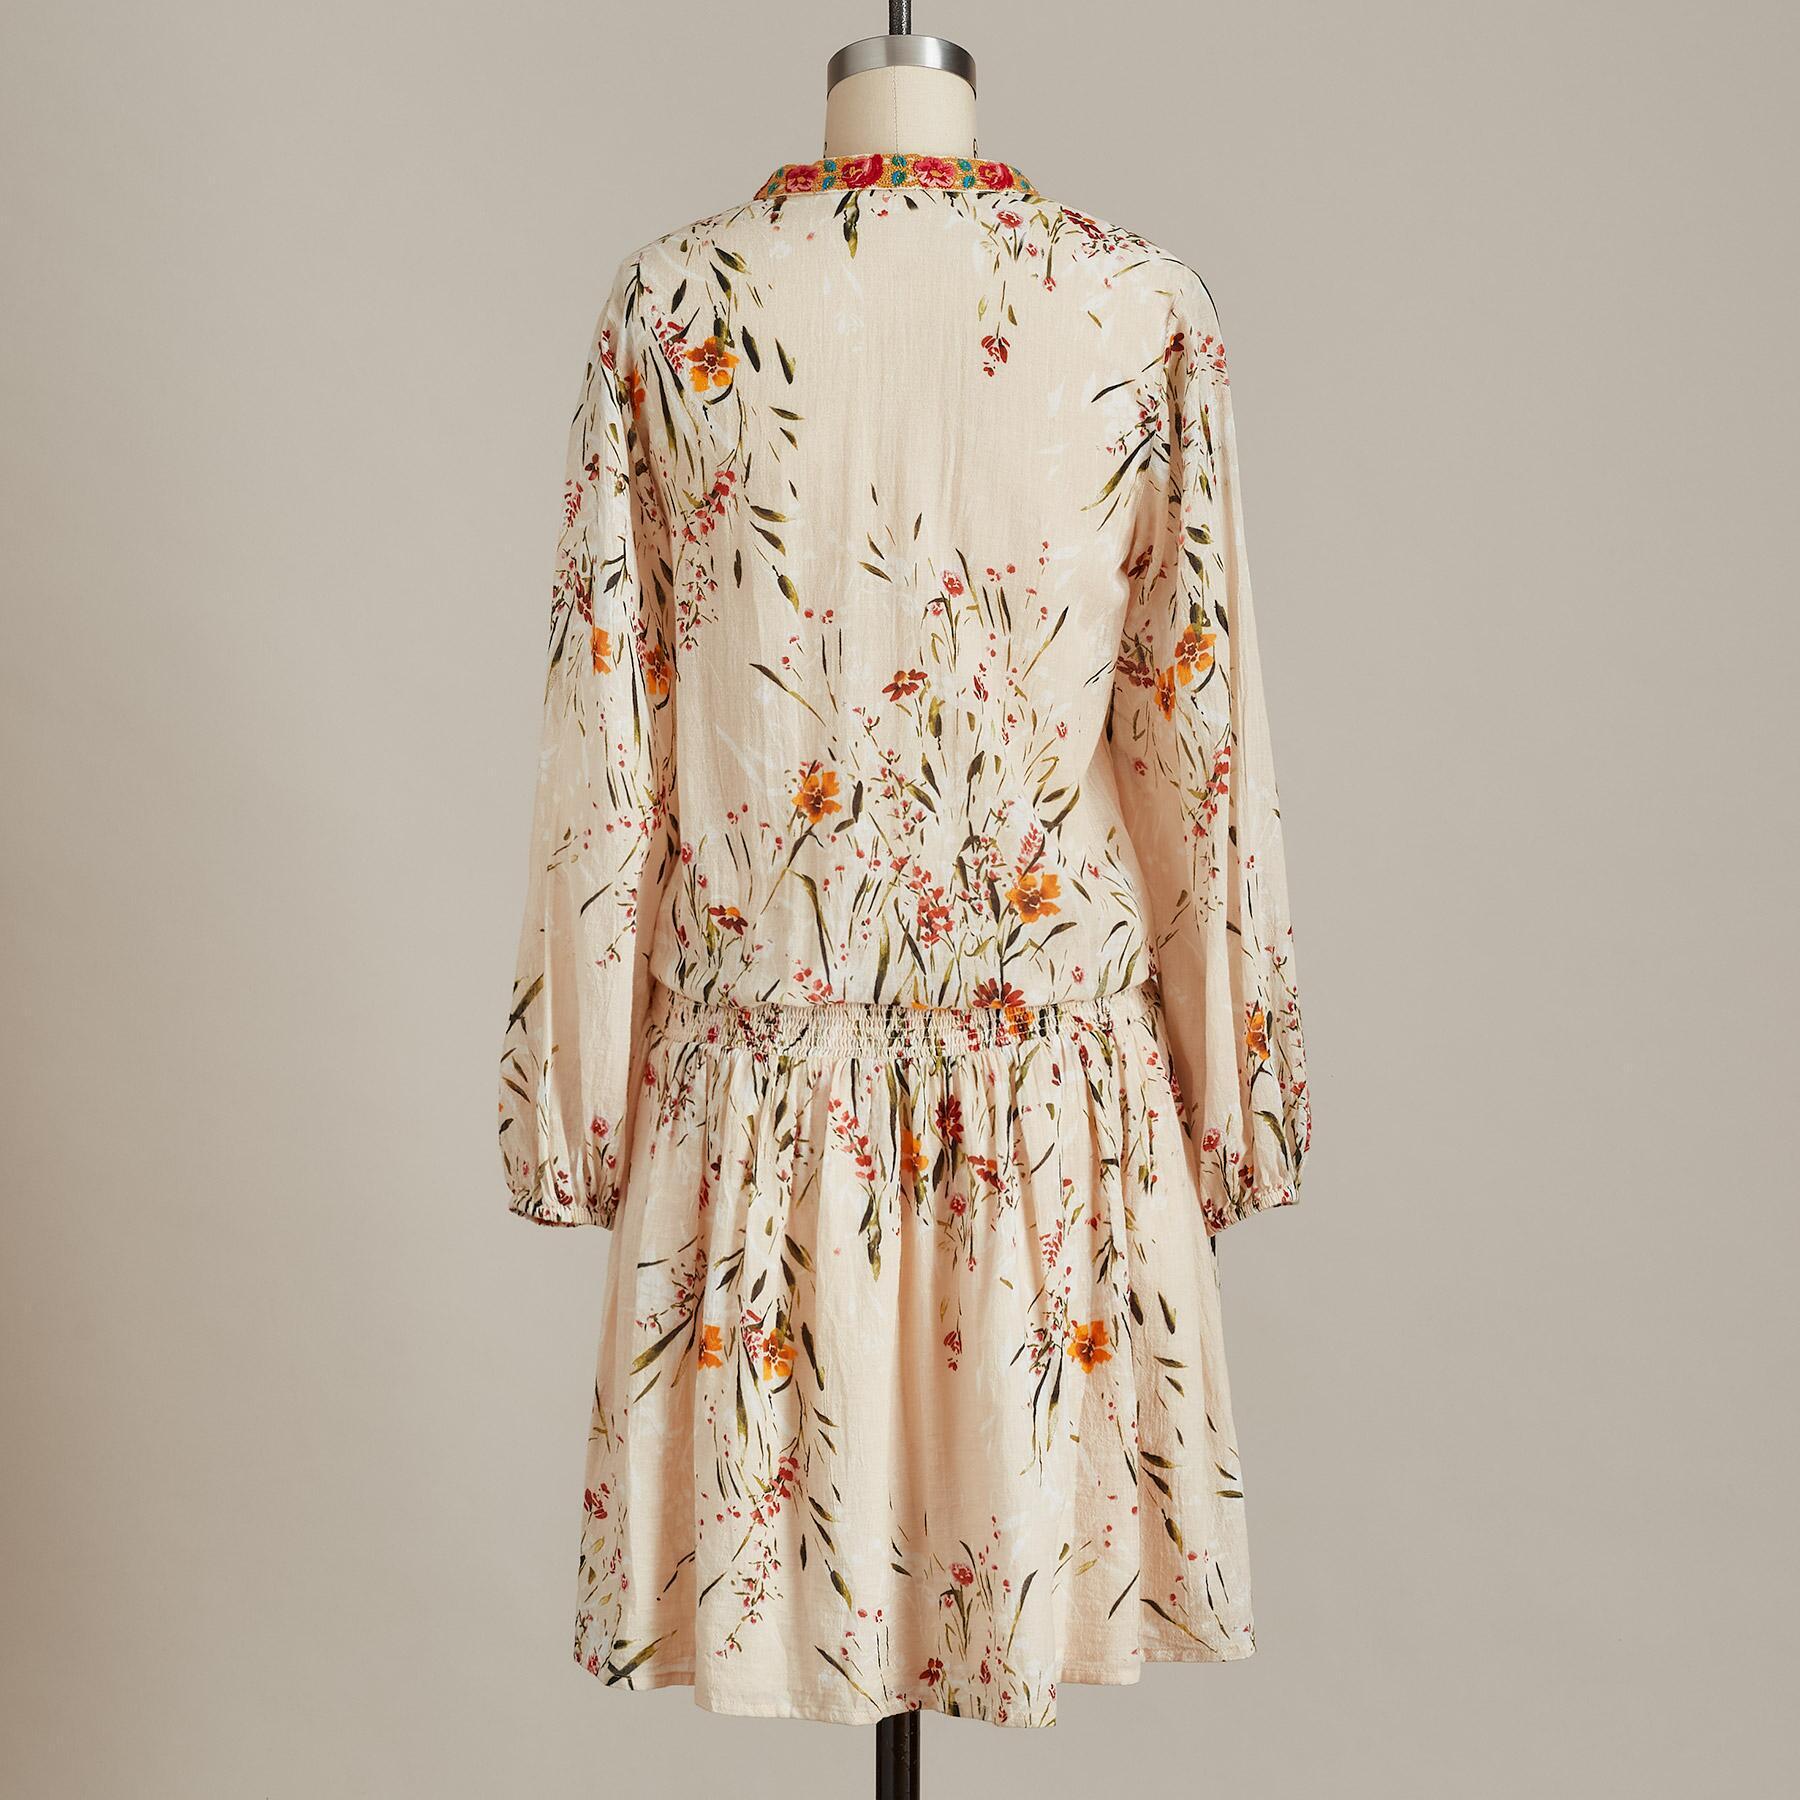 BLOOM EVERYDAY DRESS - PETITES: View 3